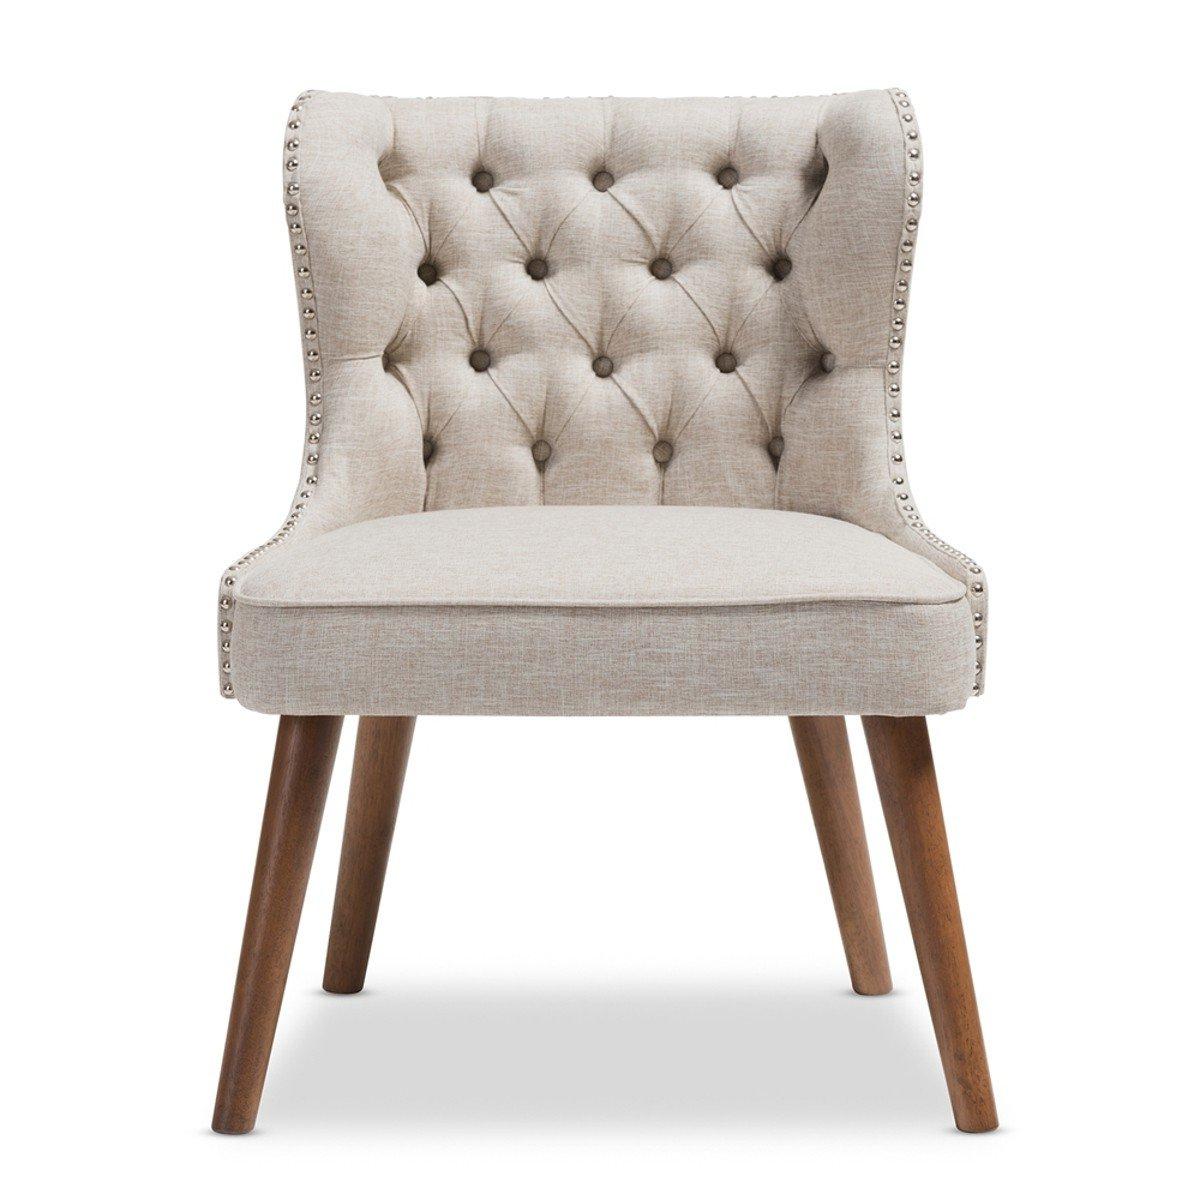 Fashionable Baxton Studio Scarlett 3pc Upholstered Living Room Set In Regarding Scarlett Beige Sofas (View 1 of 20)